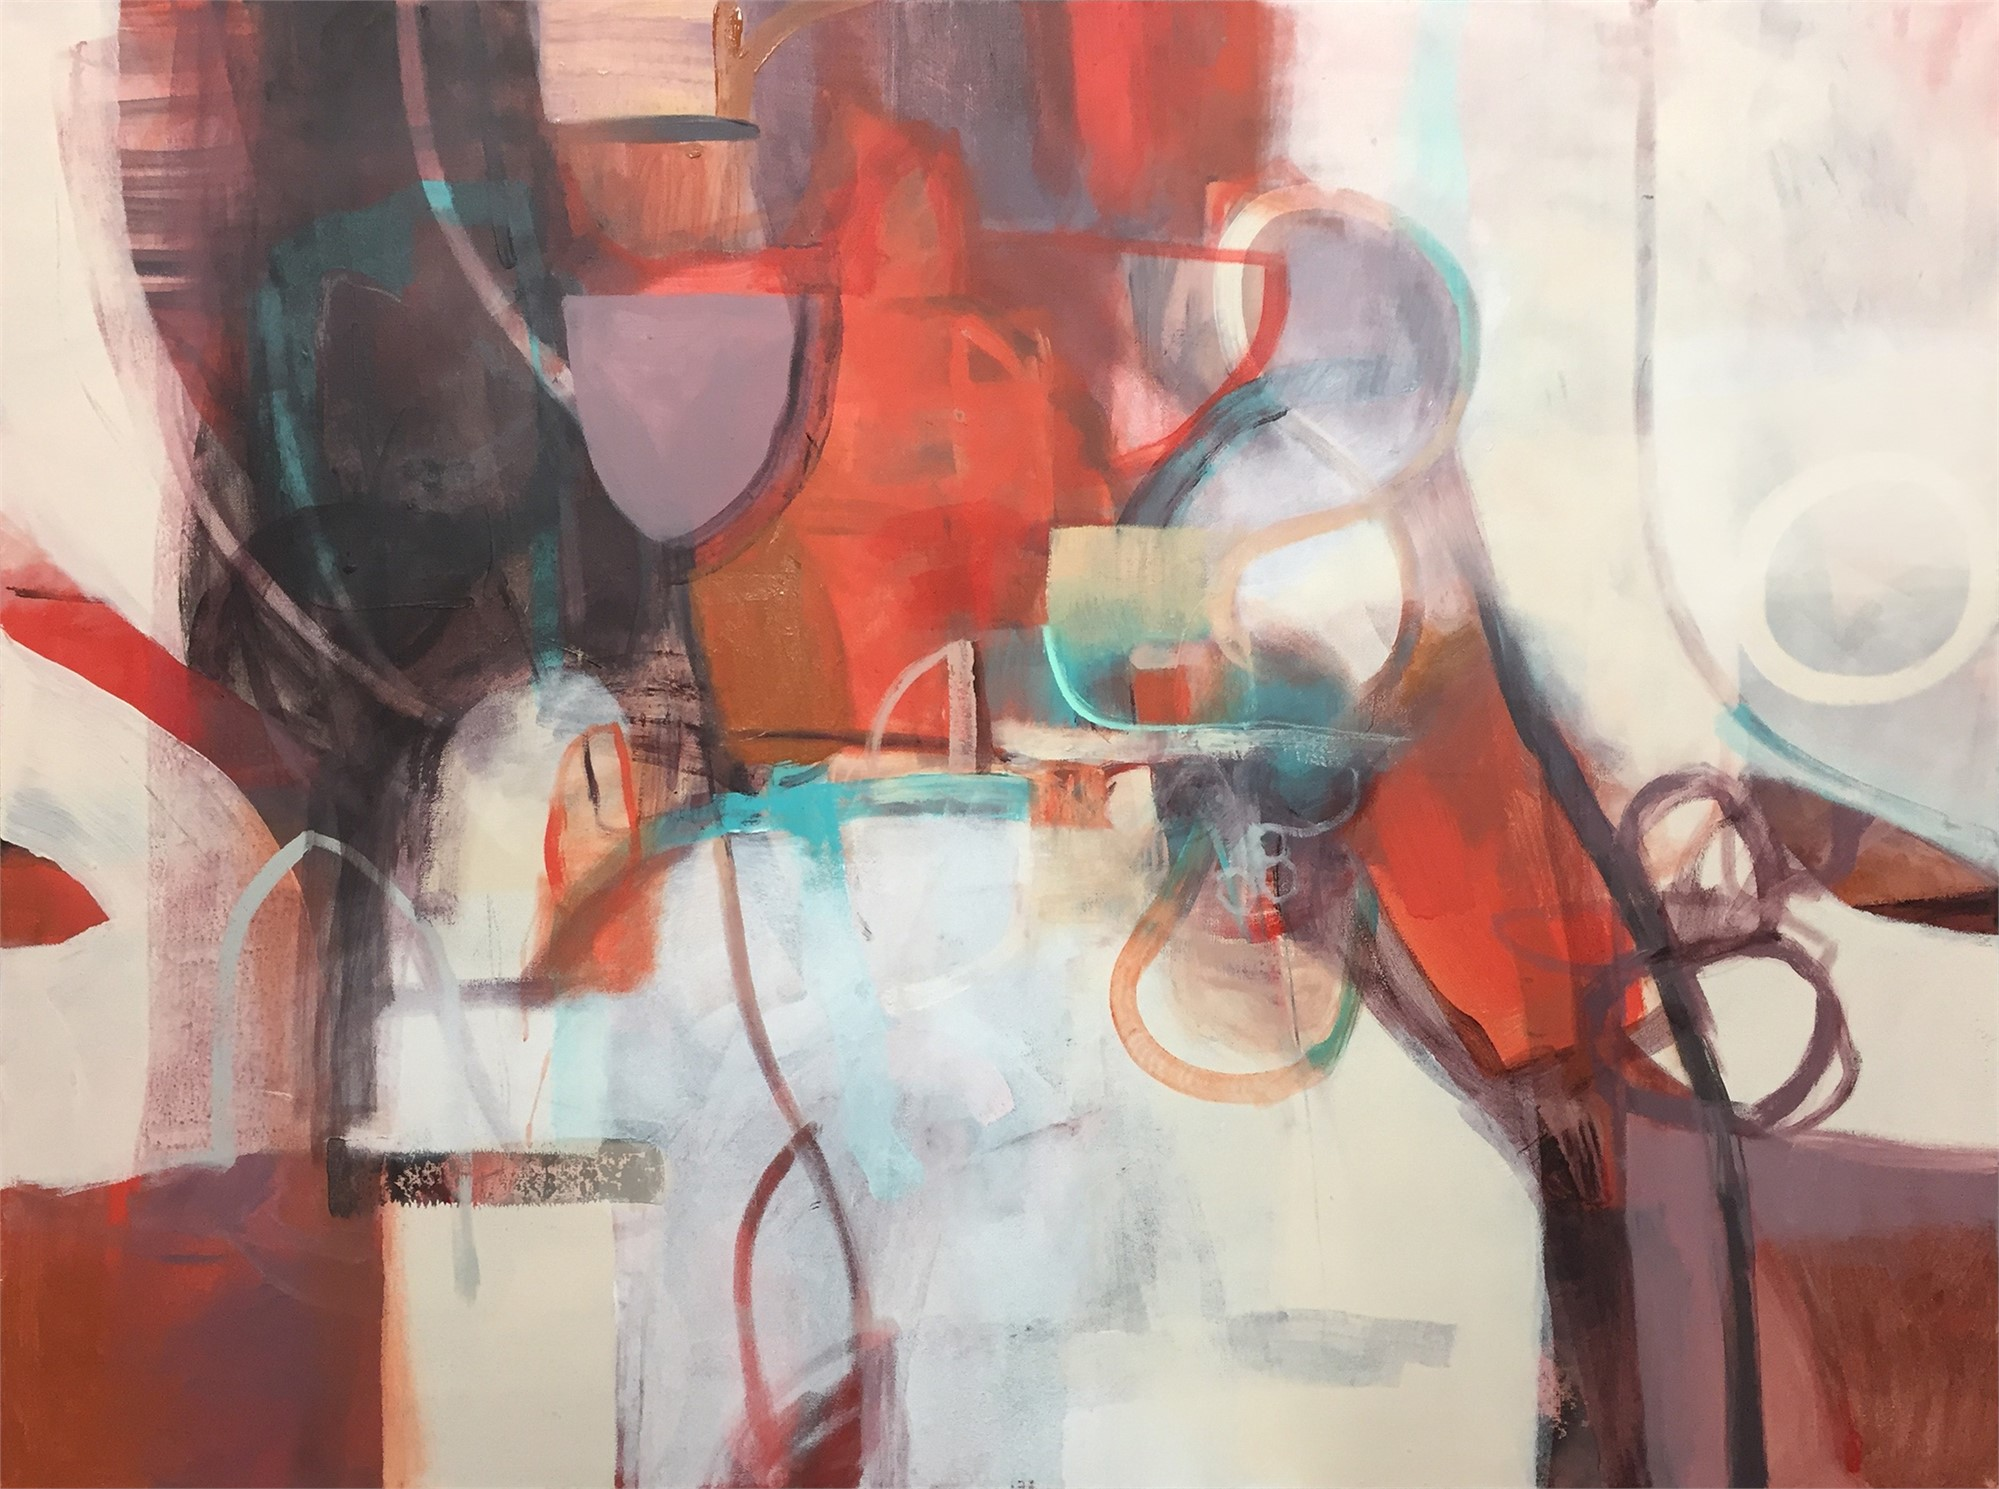 Untitled 174607 by Karen Roehl